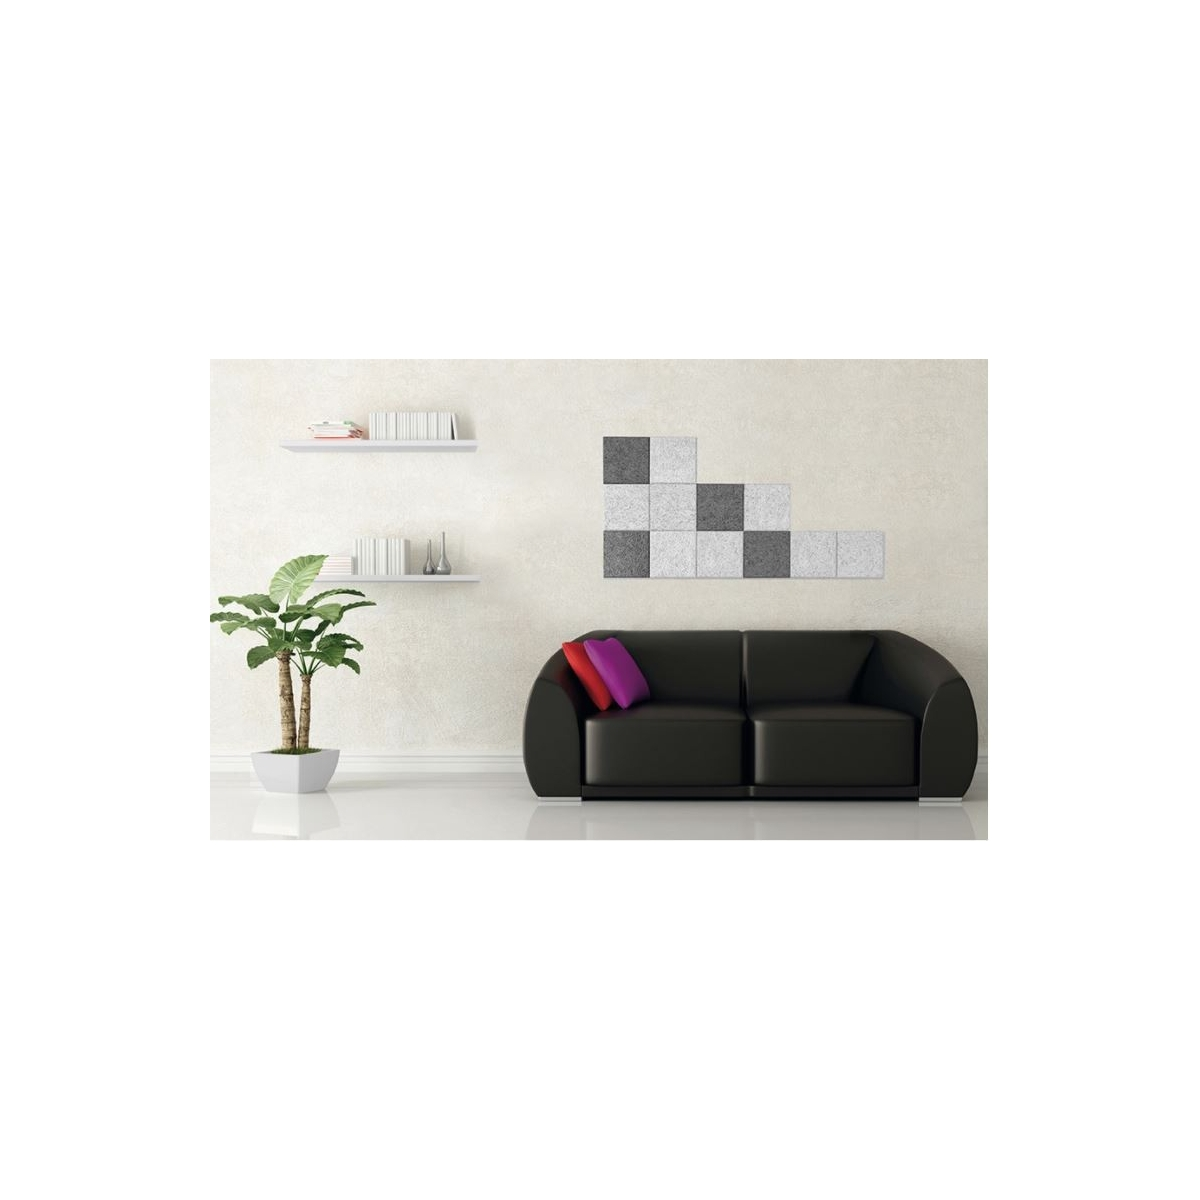 Panel sintético Legnomuro Grupo Unamacor Panel acústico para paredes color gris medio online